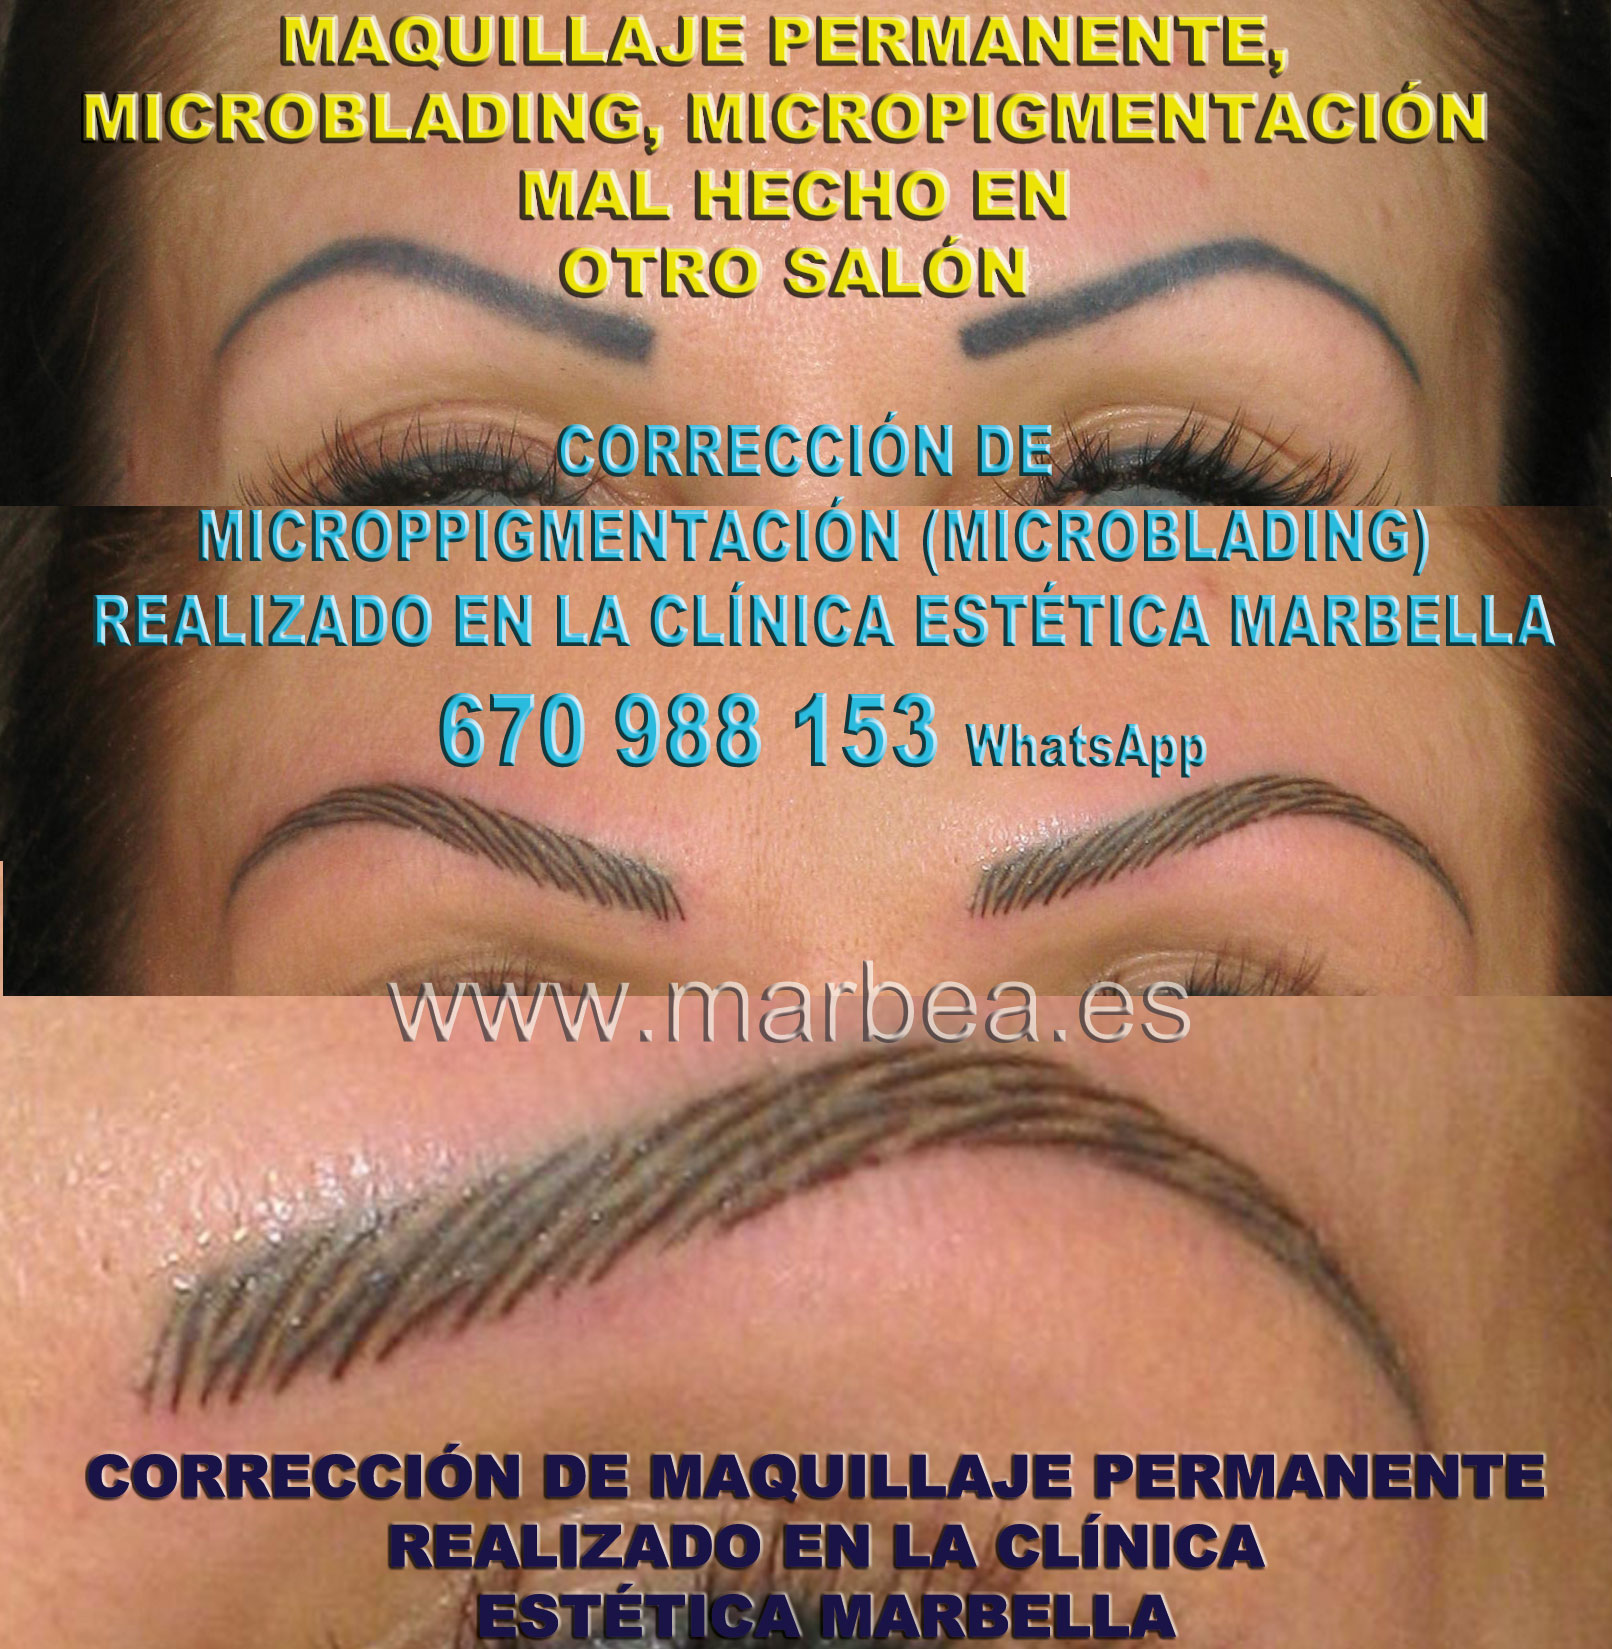 ELIMINAR TATUAJE CEJAS clínica estética delineados ofrece micropigmentacion correctiva de cejas,micropigmentación correctiva cejas mal hecha